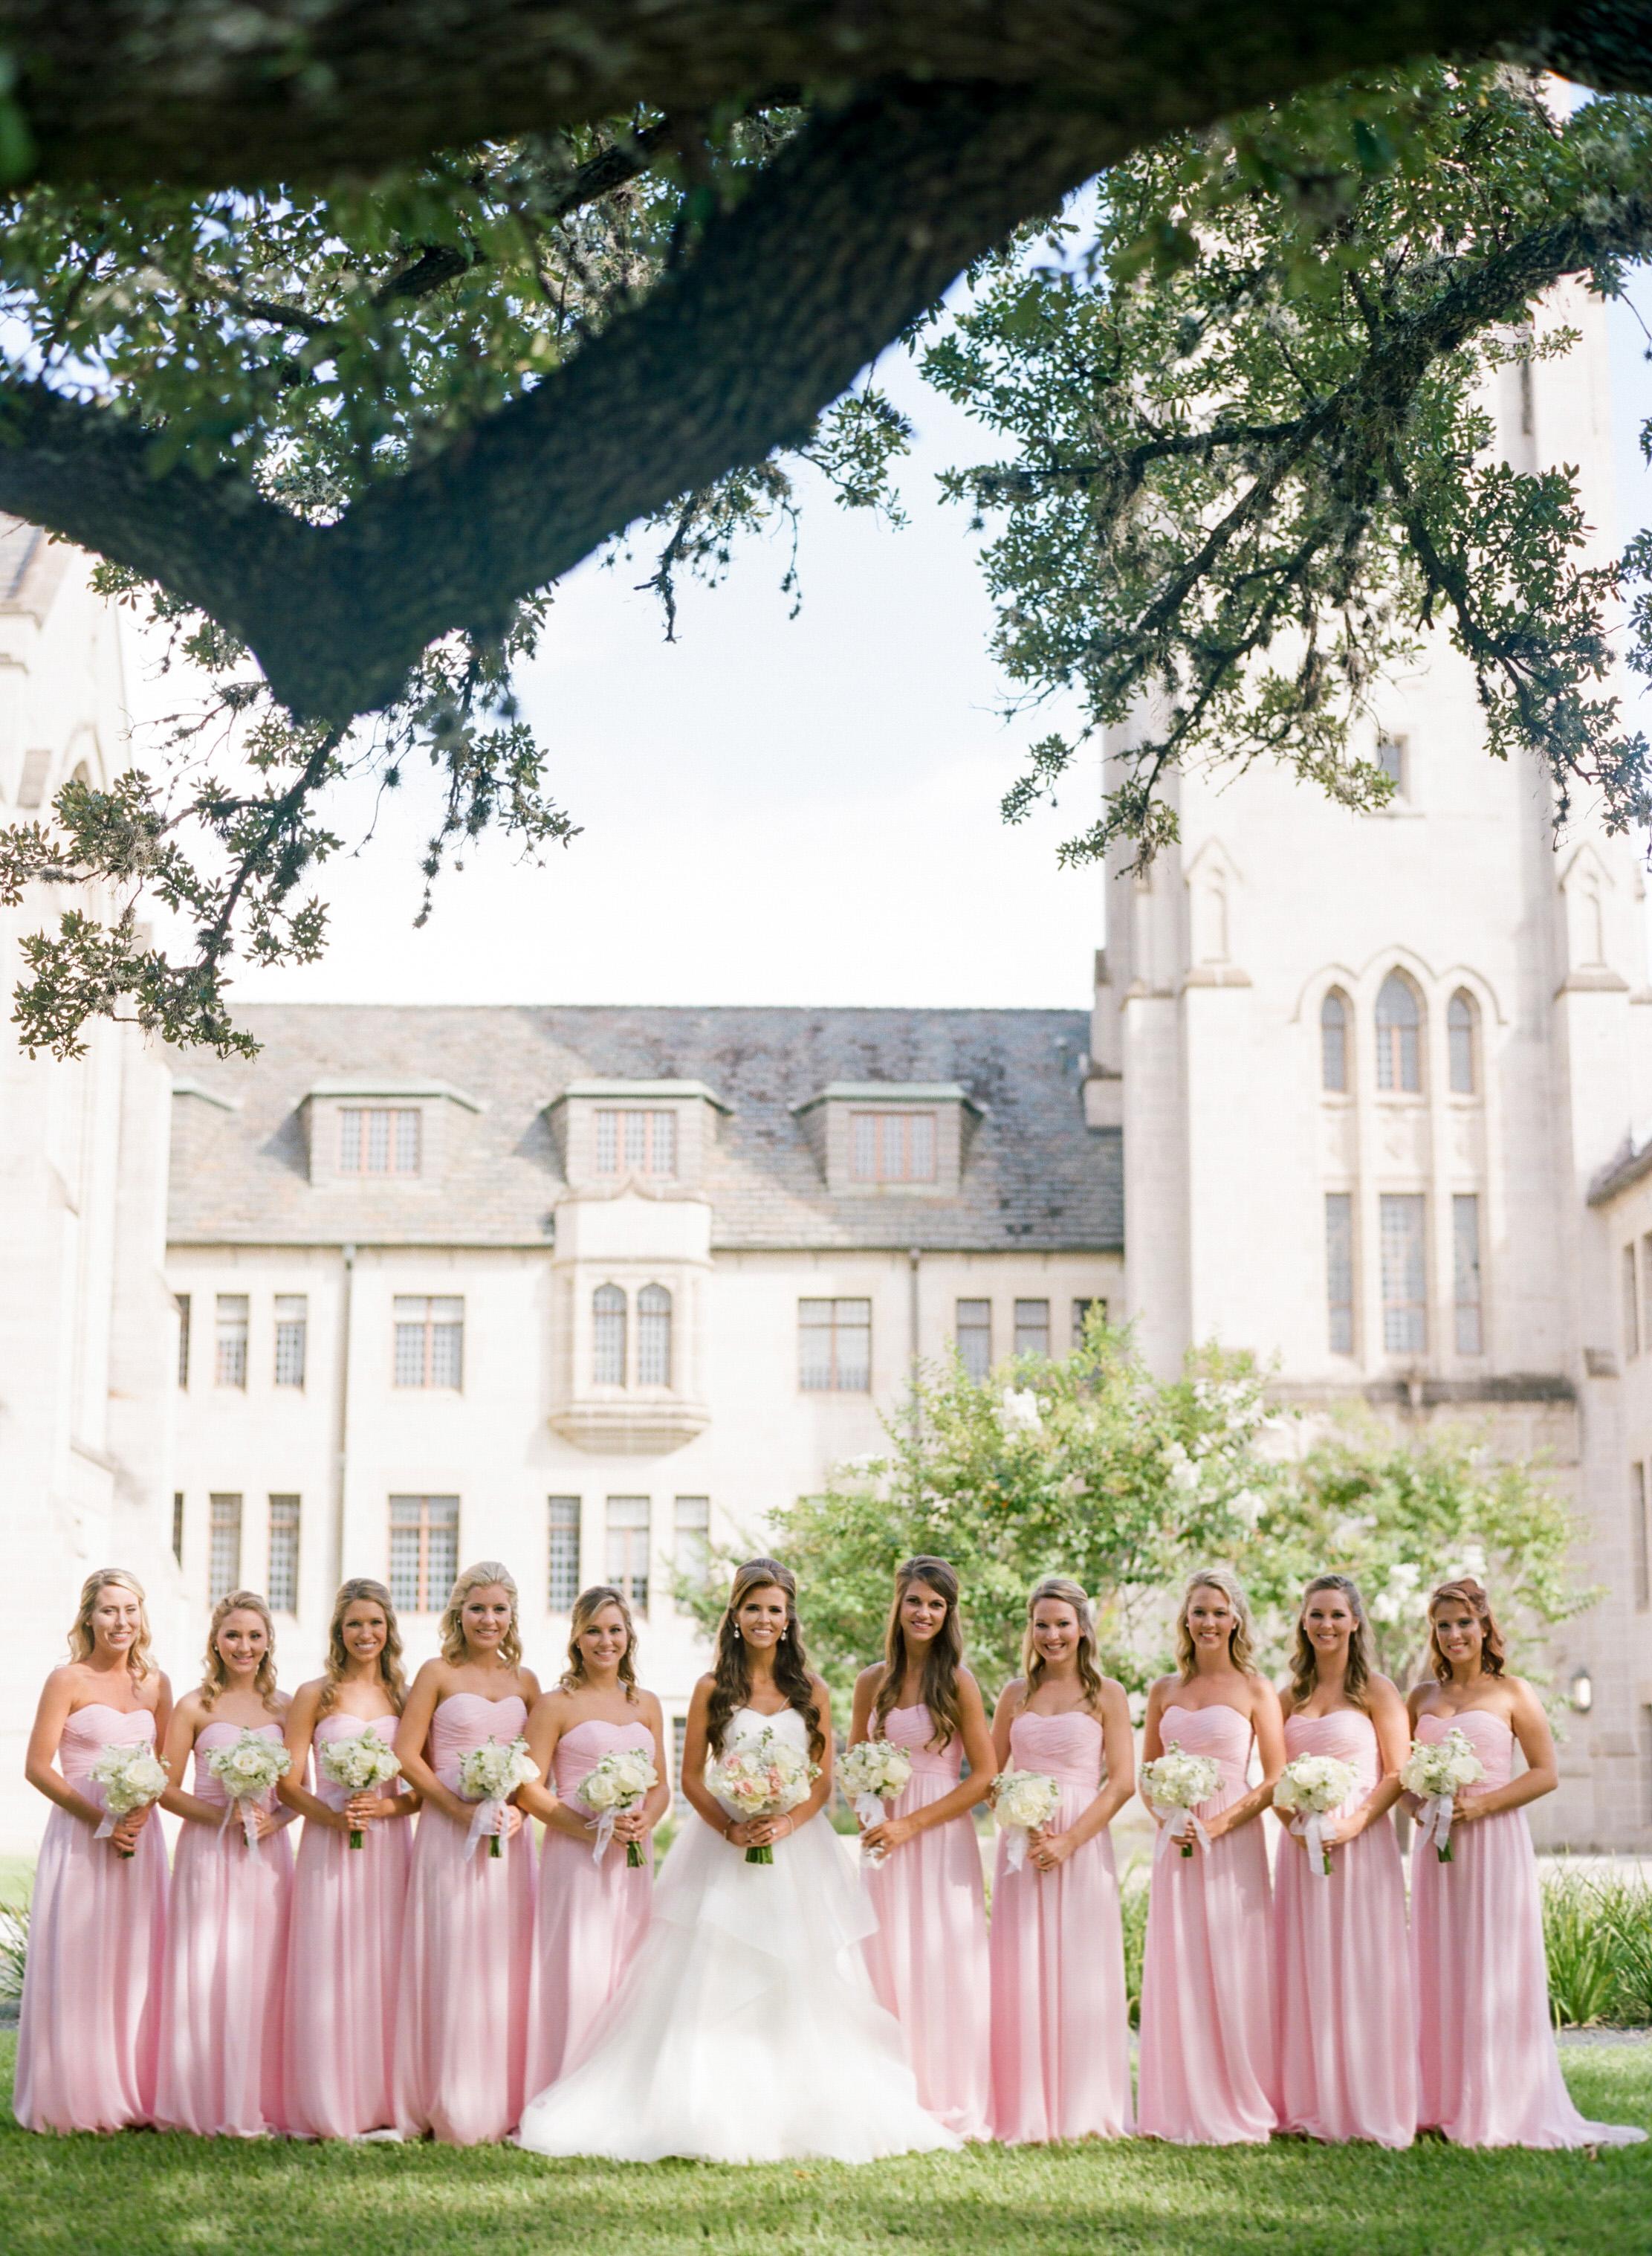 Dana-Fernandez-Photography-Weddings-in-Houston-Magazine-feature-Houston-wedding-photographer-film-31.jpg